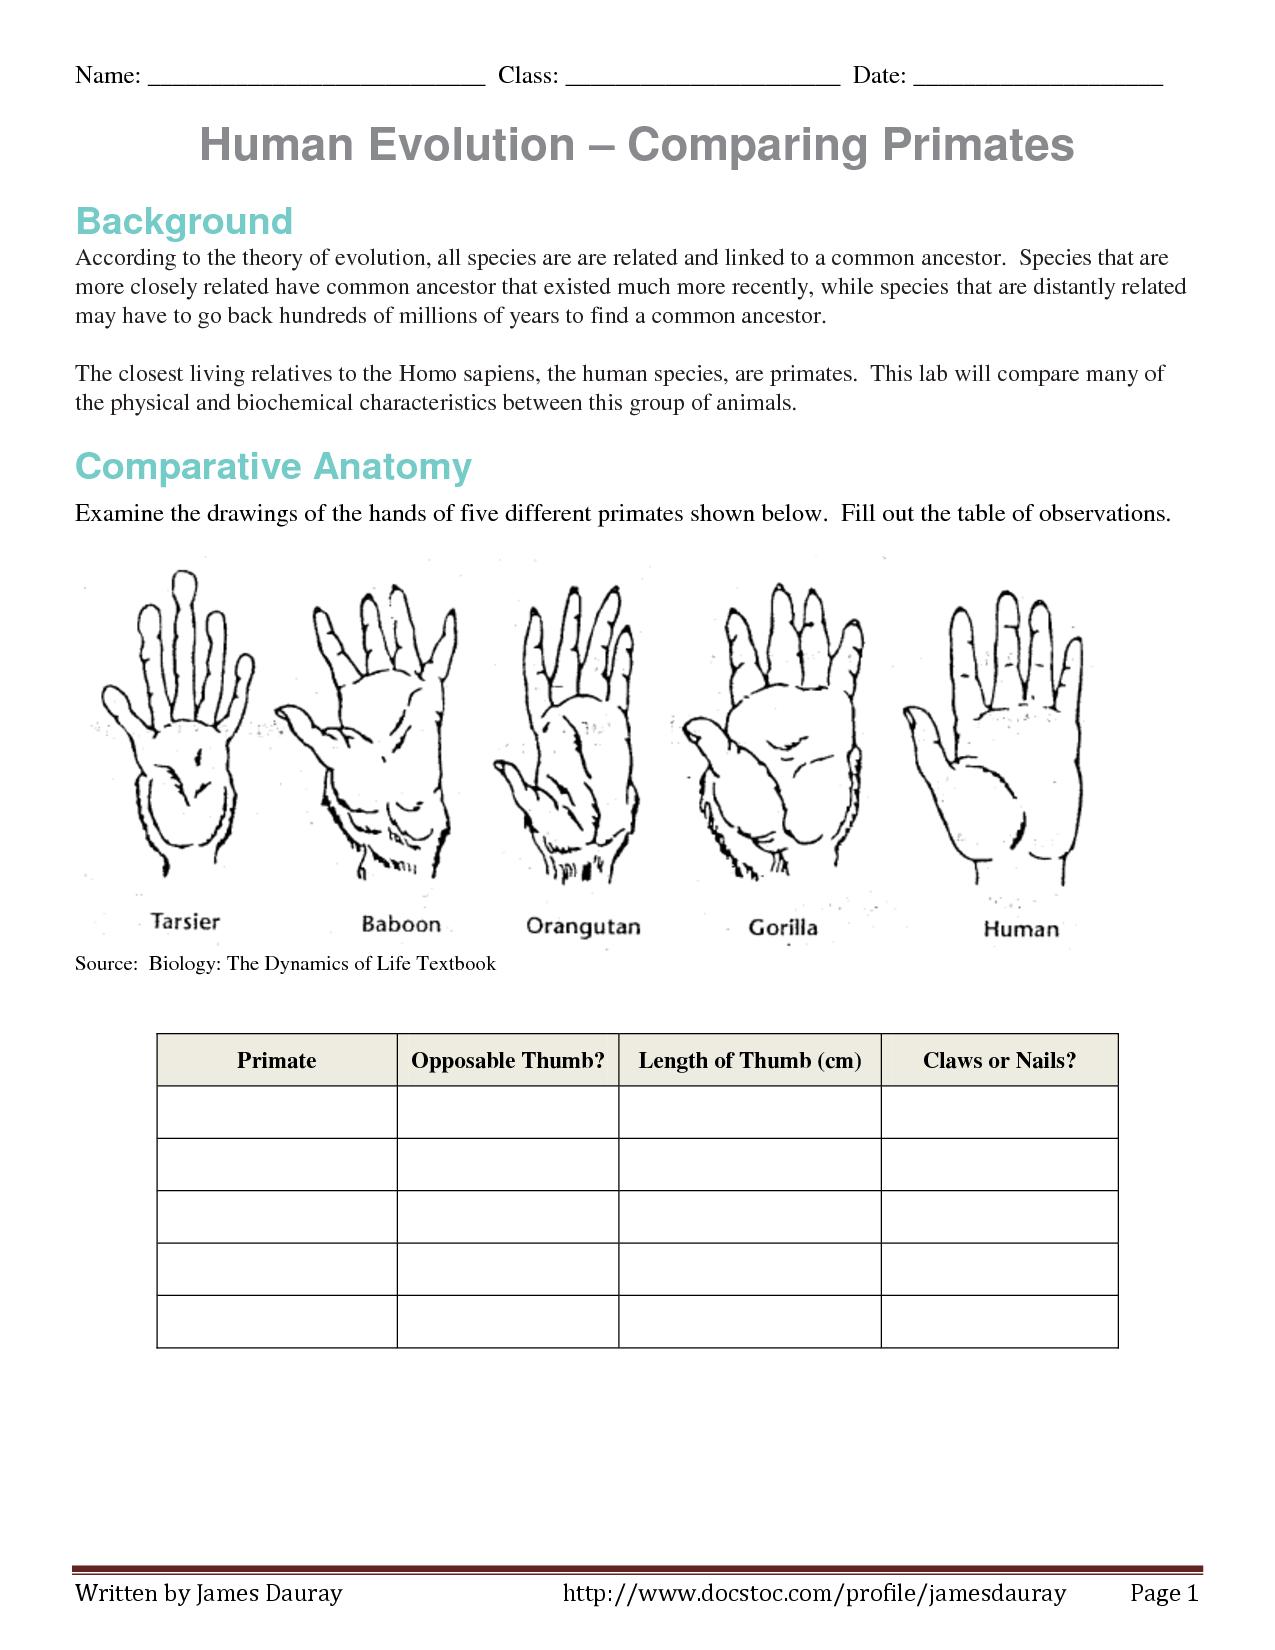 medium resolution of Comparative Anatomy Worksheet Answers - Anatomy Drawing Diagram